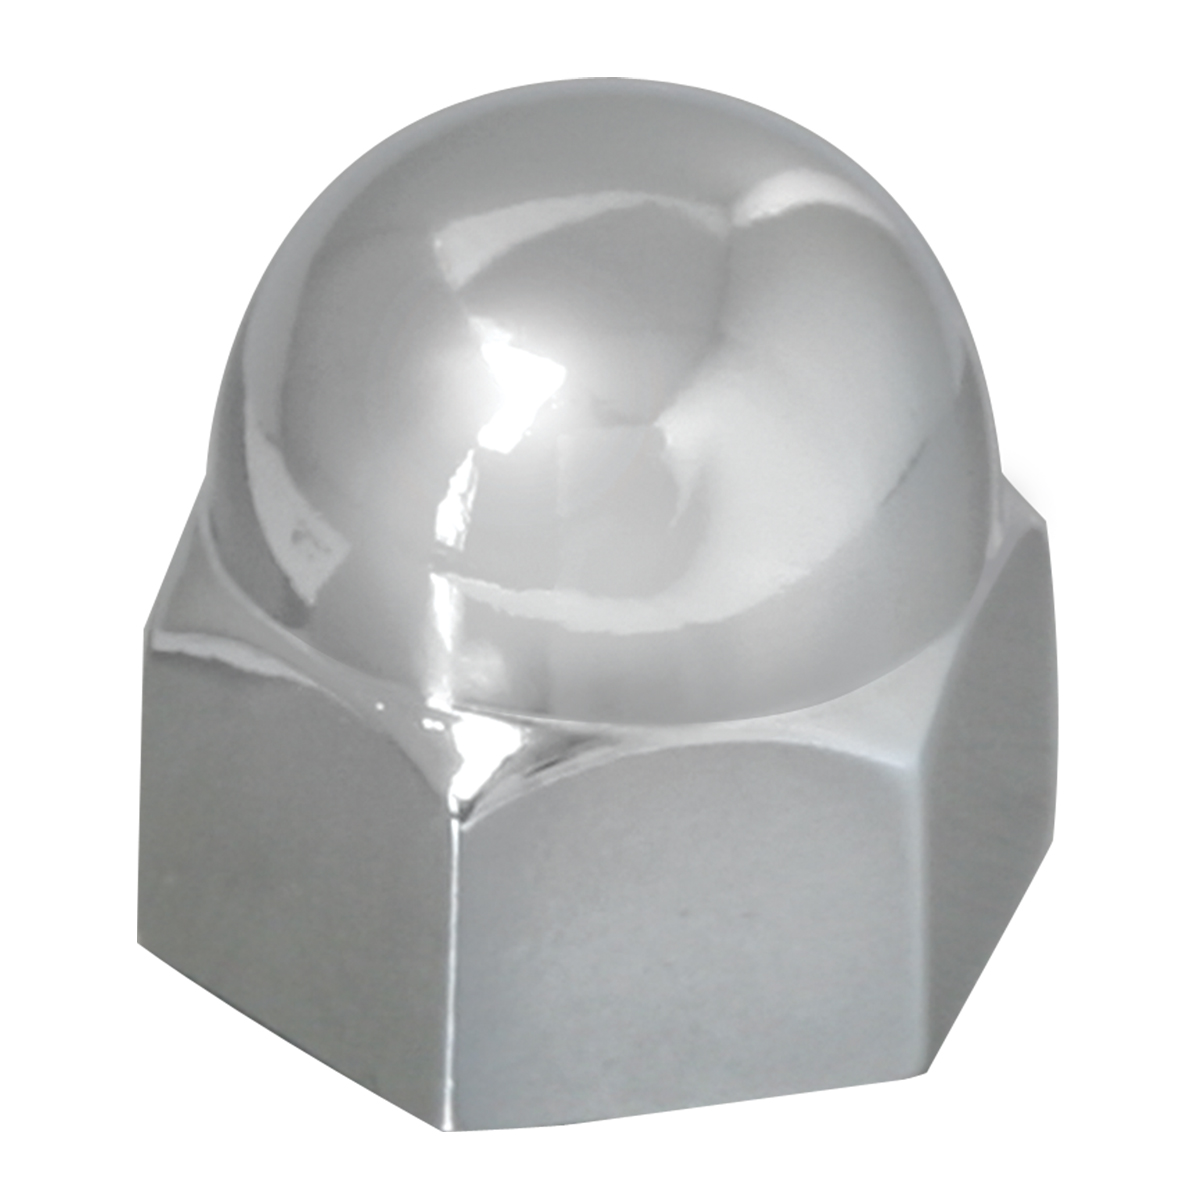 Push-On Acorn Lug Nut Cover